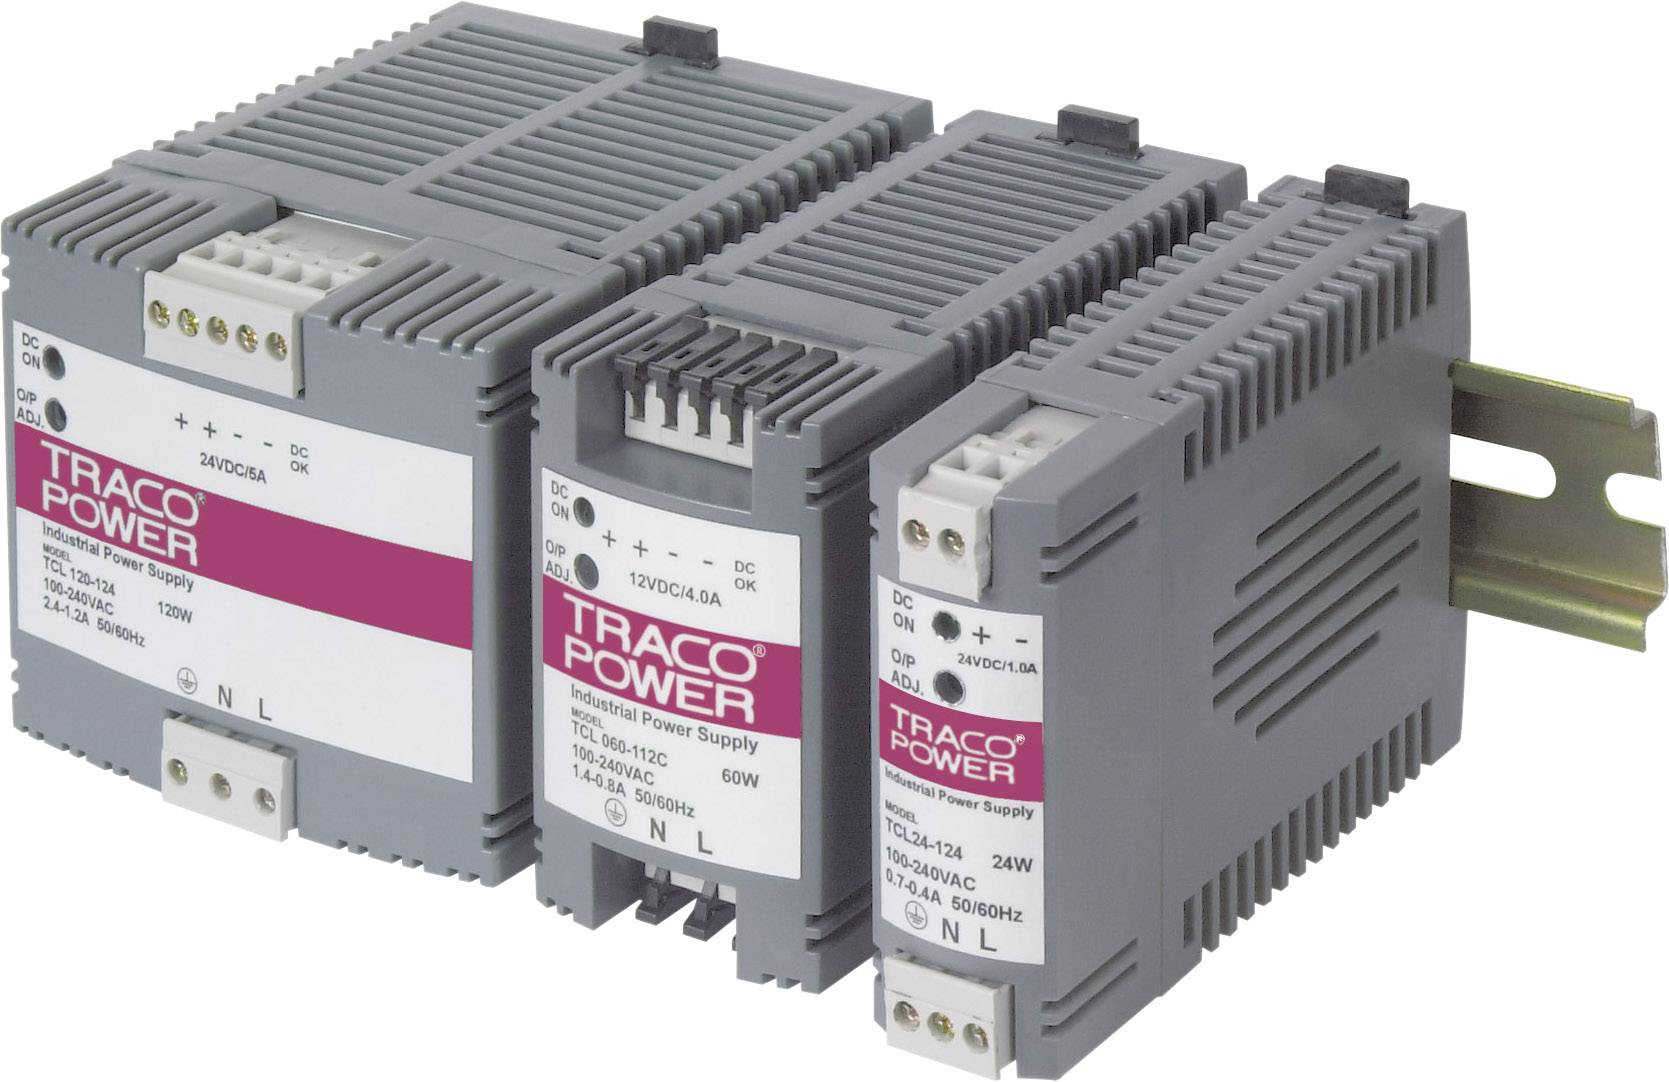 Zdroj na DIN lištu TracoPower TCL 060-124, 24 V/DC, 2,5 A